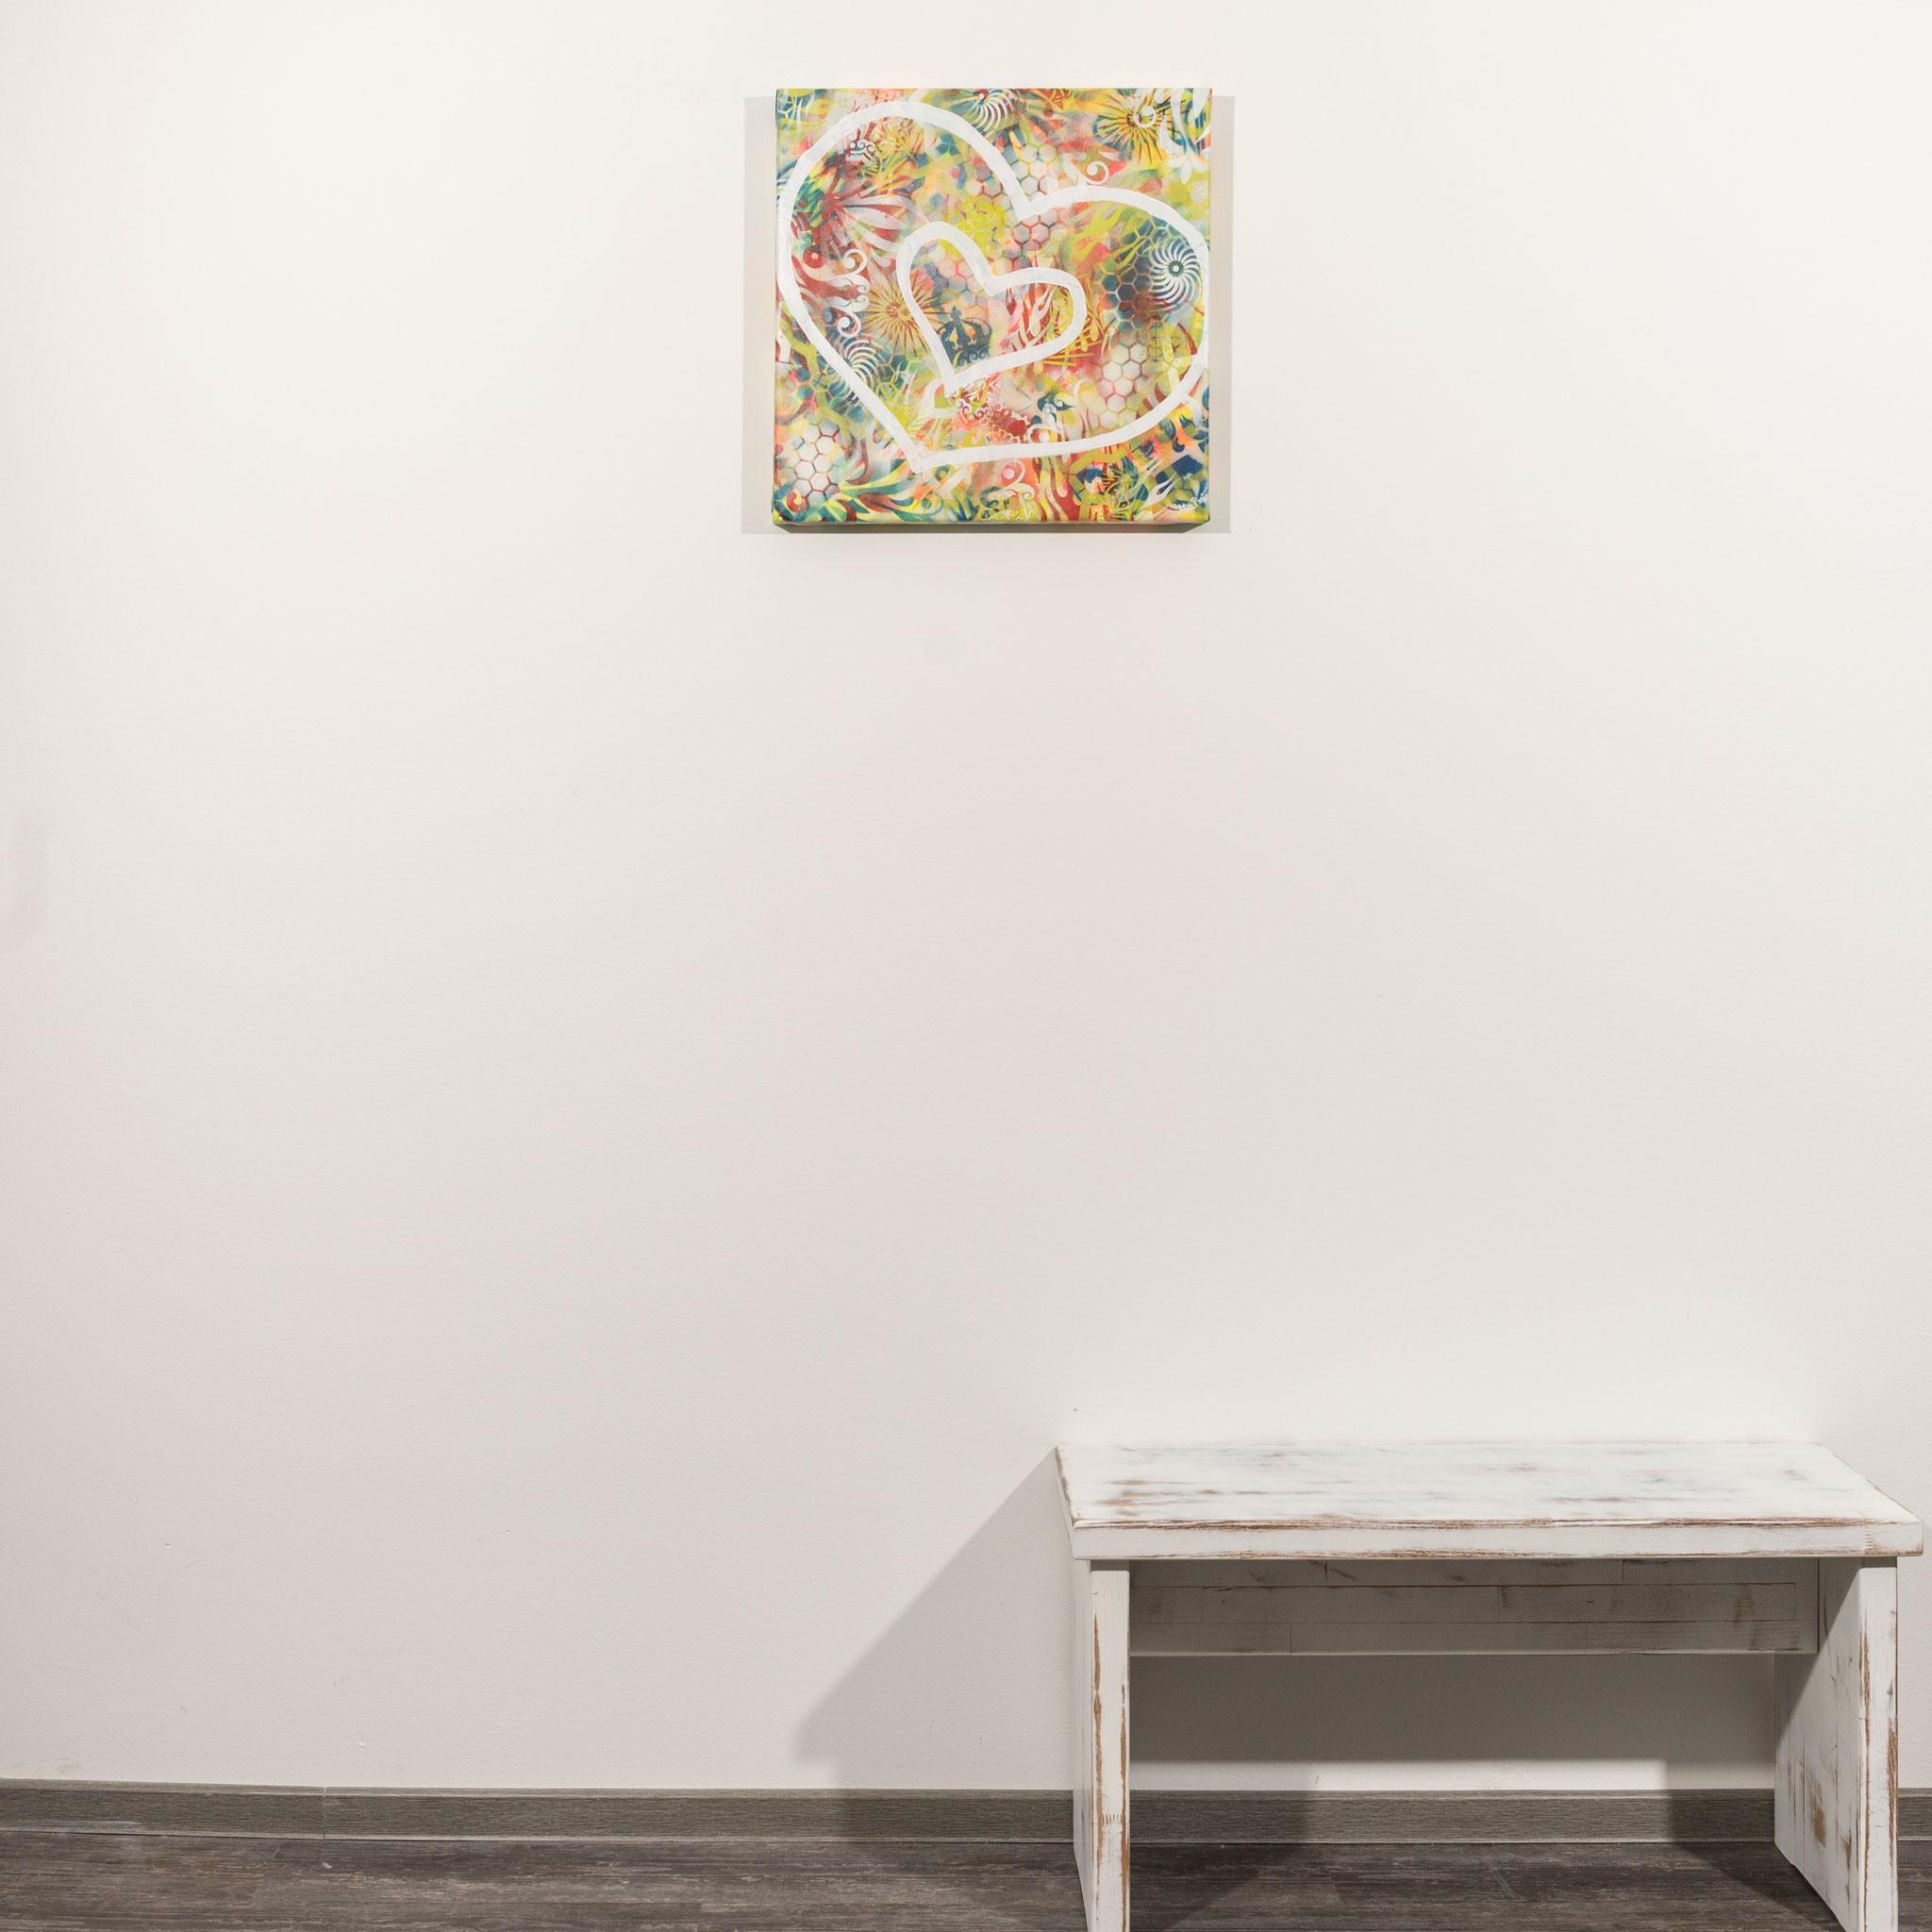 # 93 Herzenswelt ´21.            50 x 50cm